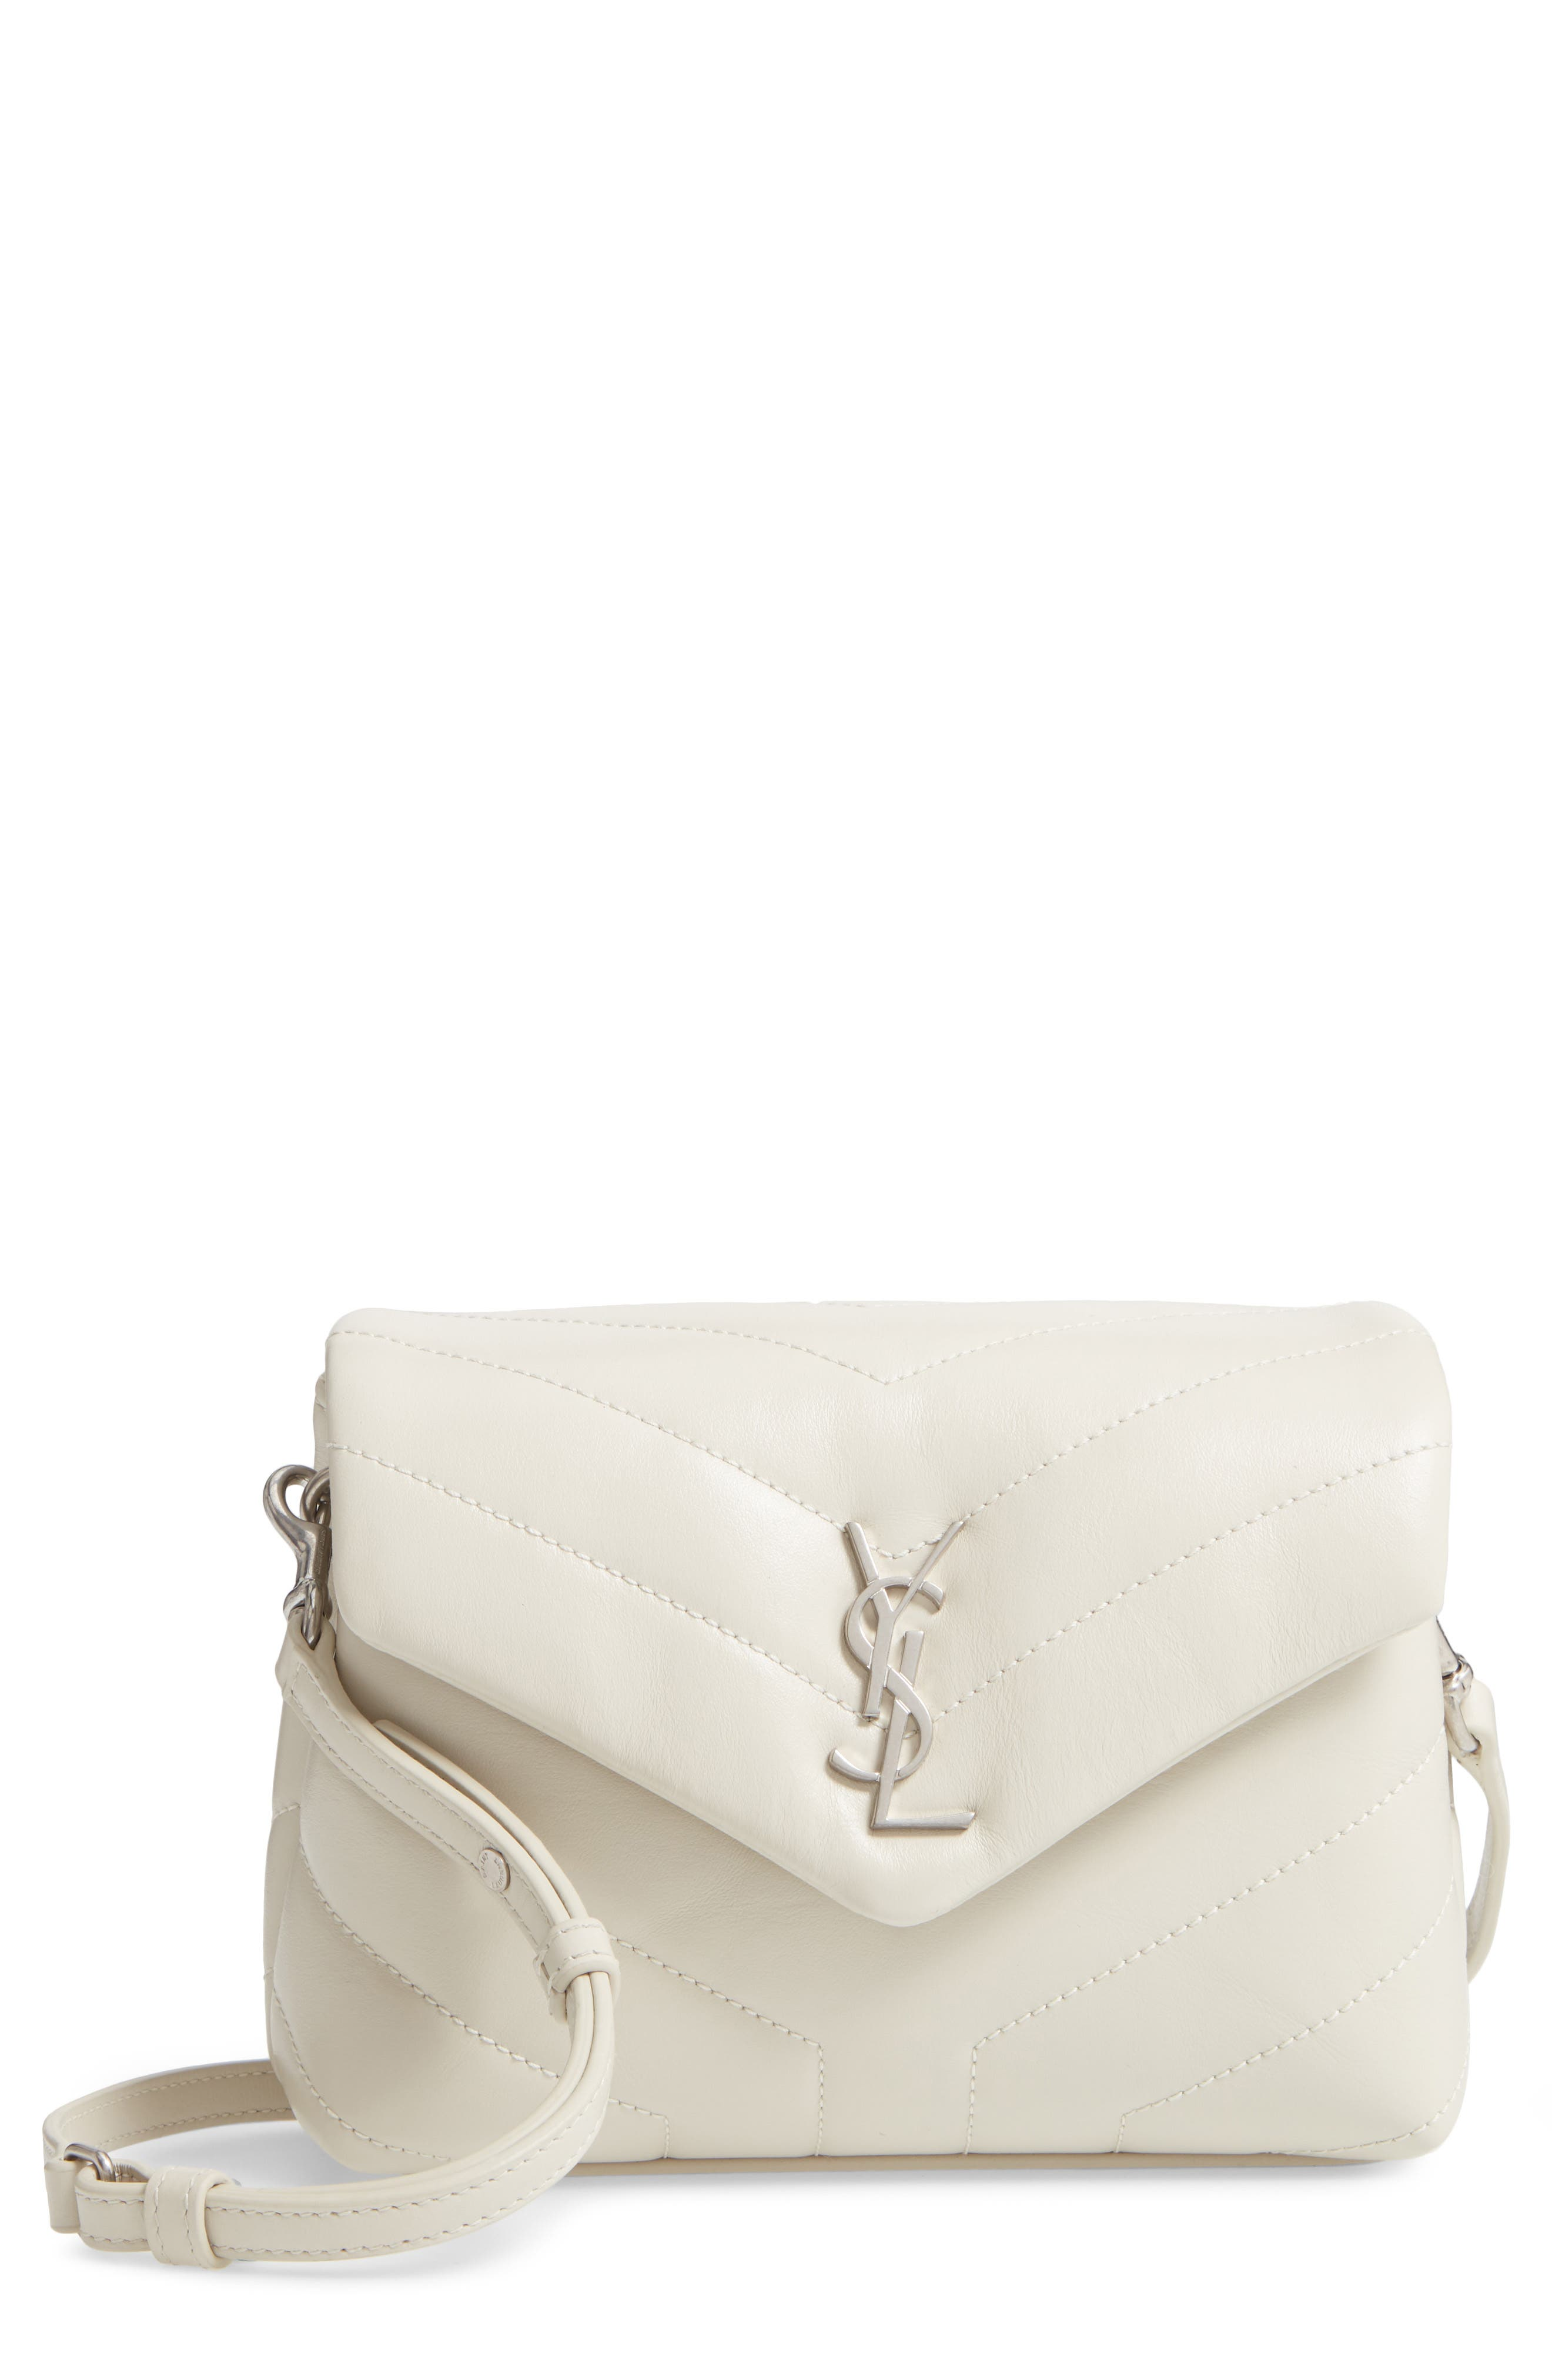 SAINT LAURENT, Toy Loulou Calfskin Leather Crossbody Bag, Main thumbnail 1, color, CREMA SOFT